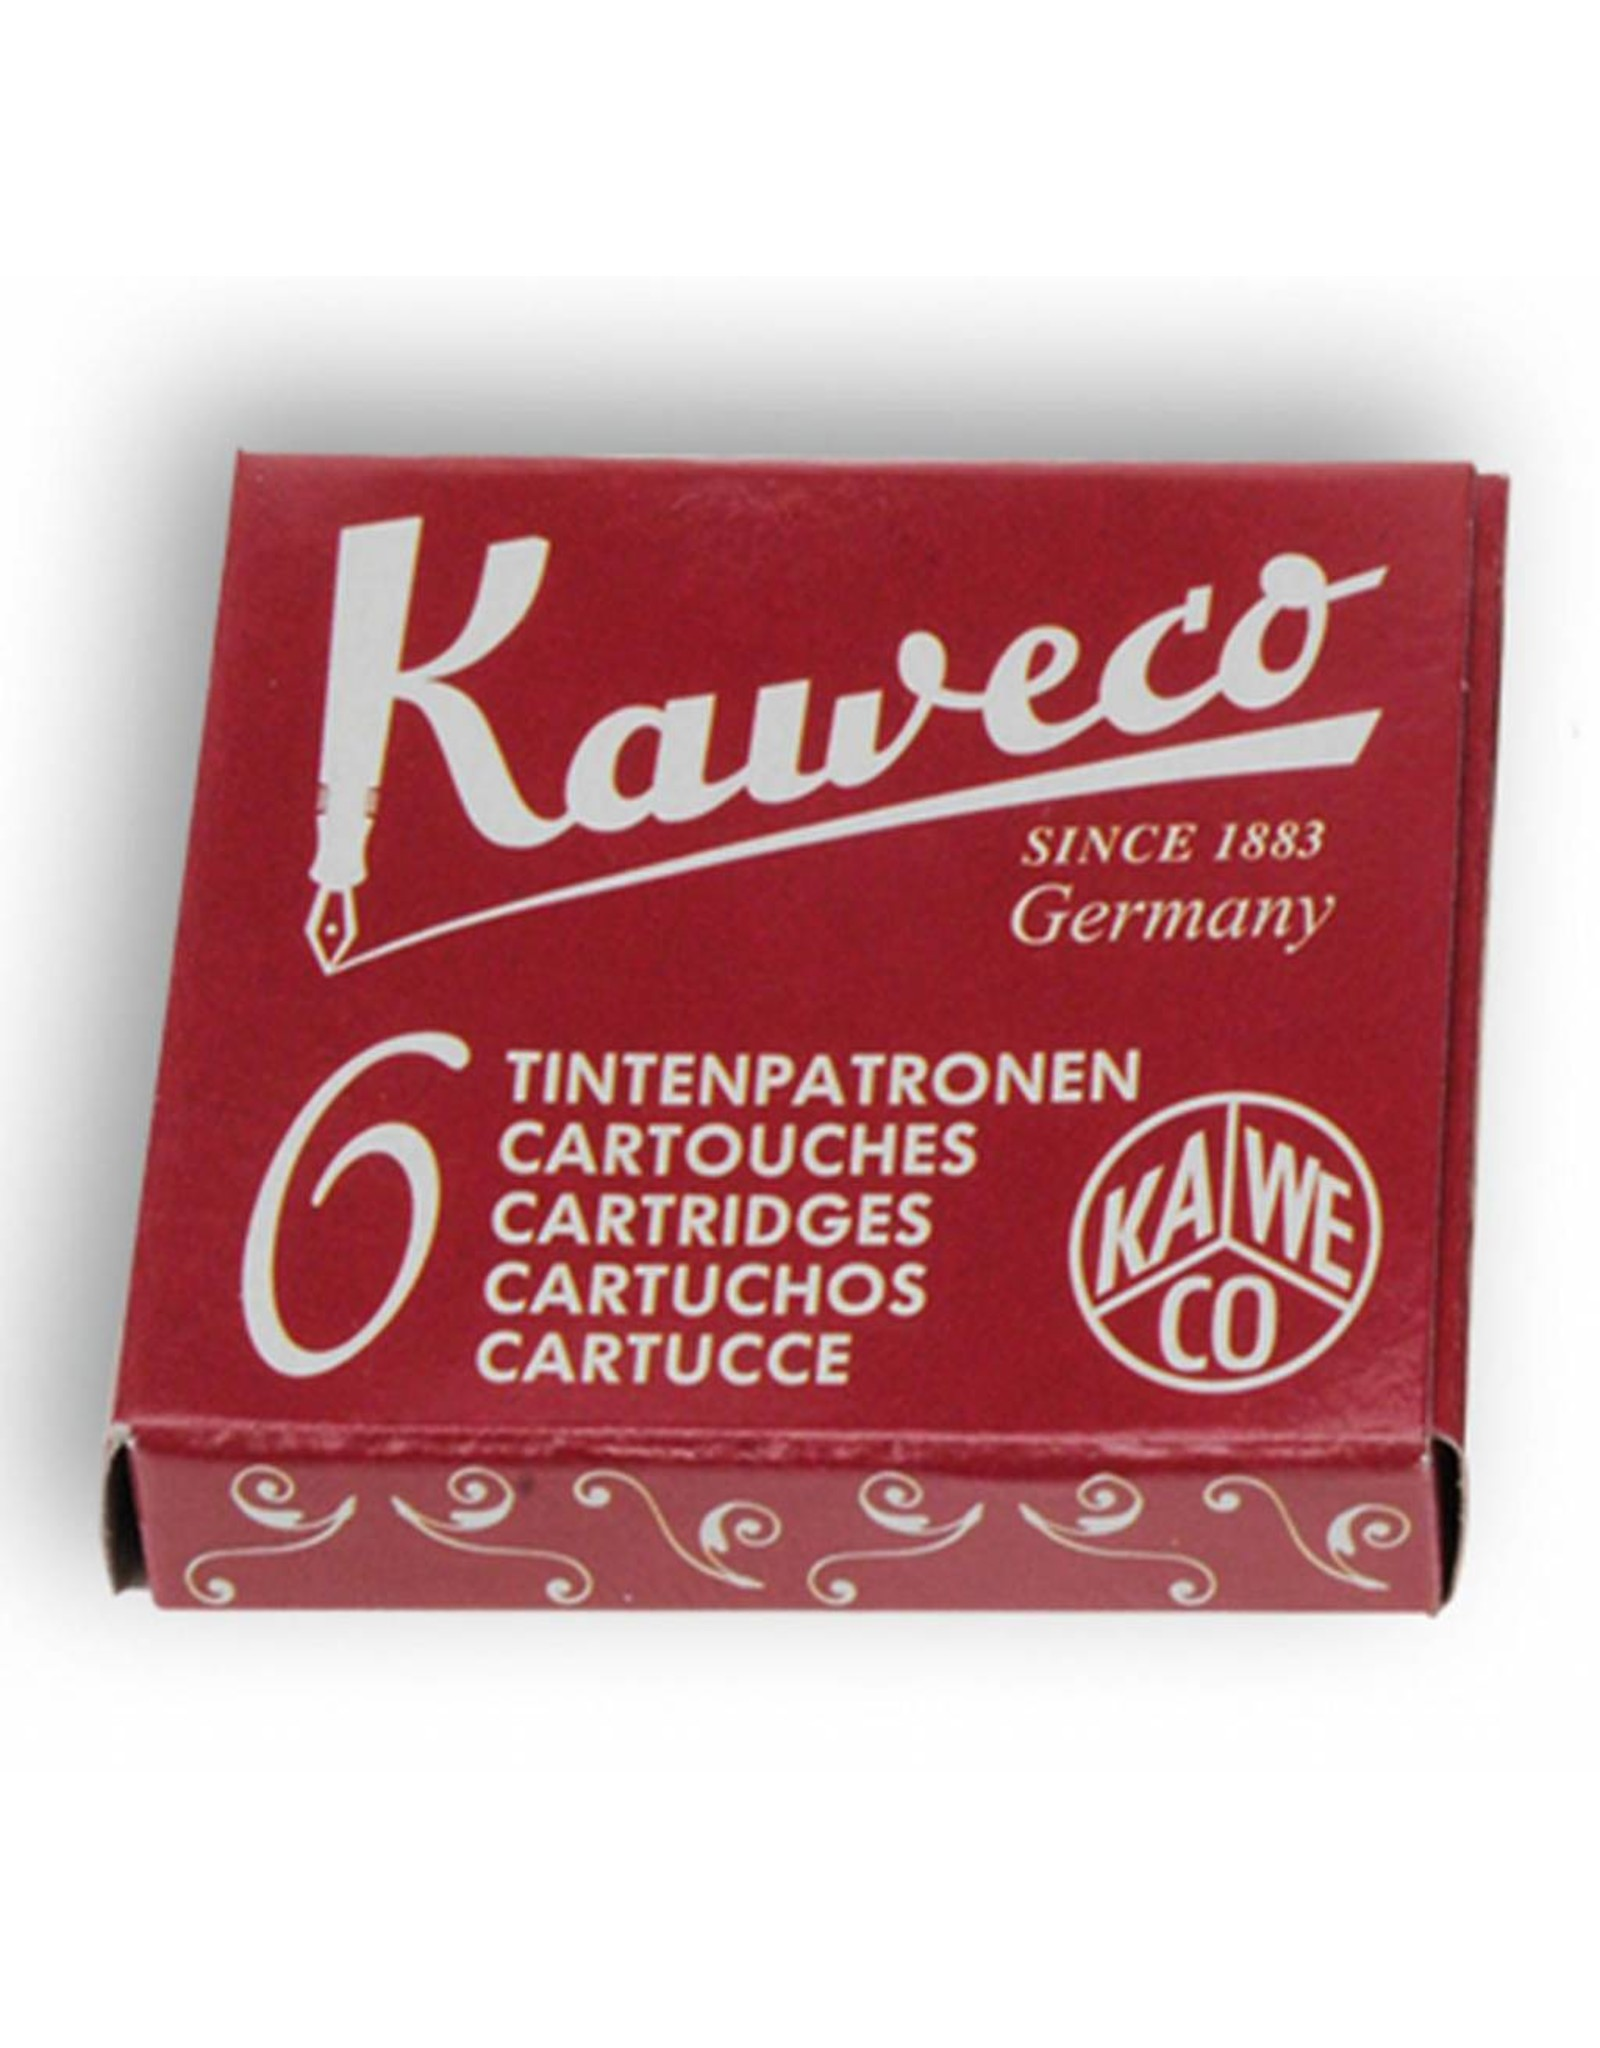 Kaweco vulpen vullingen (6) ruby red